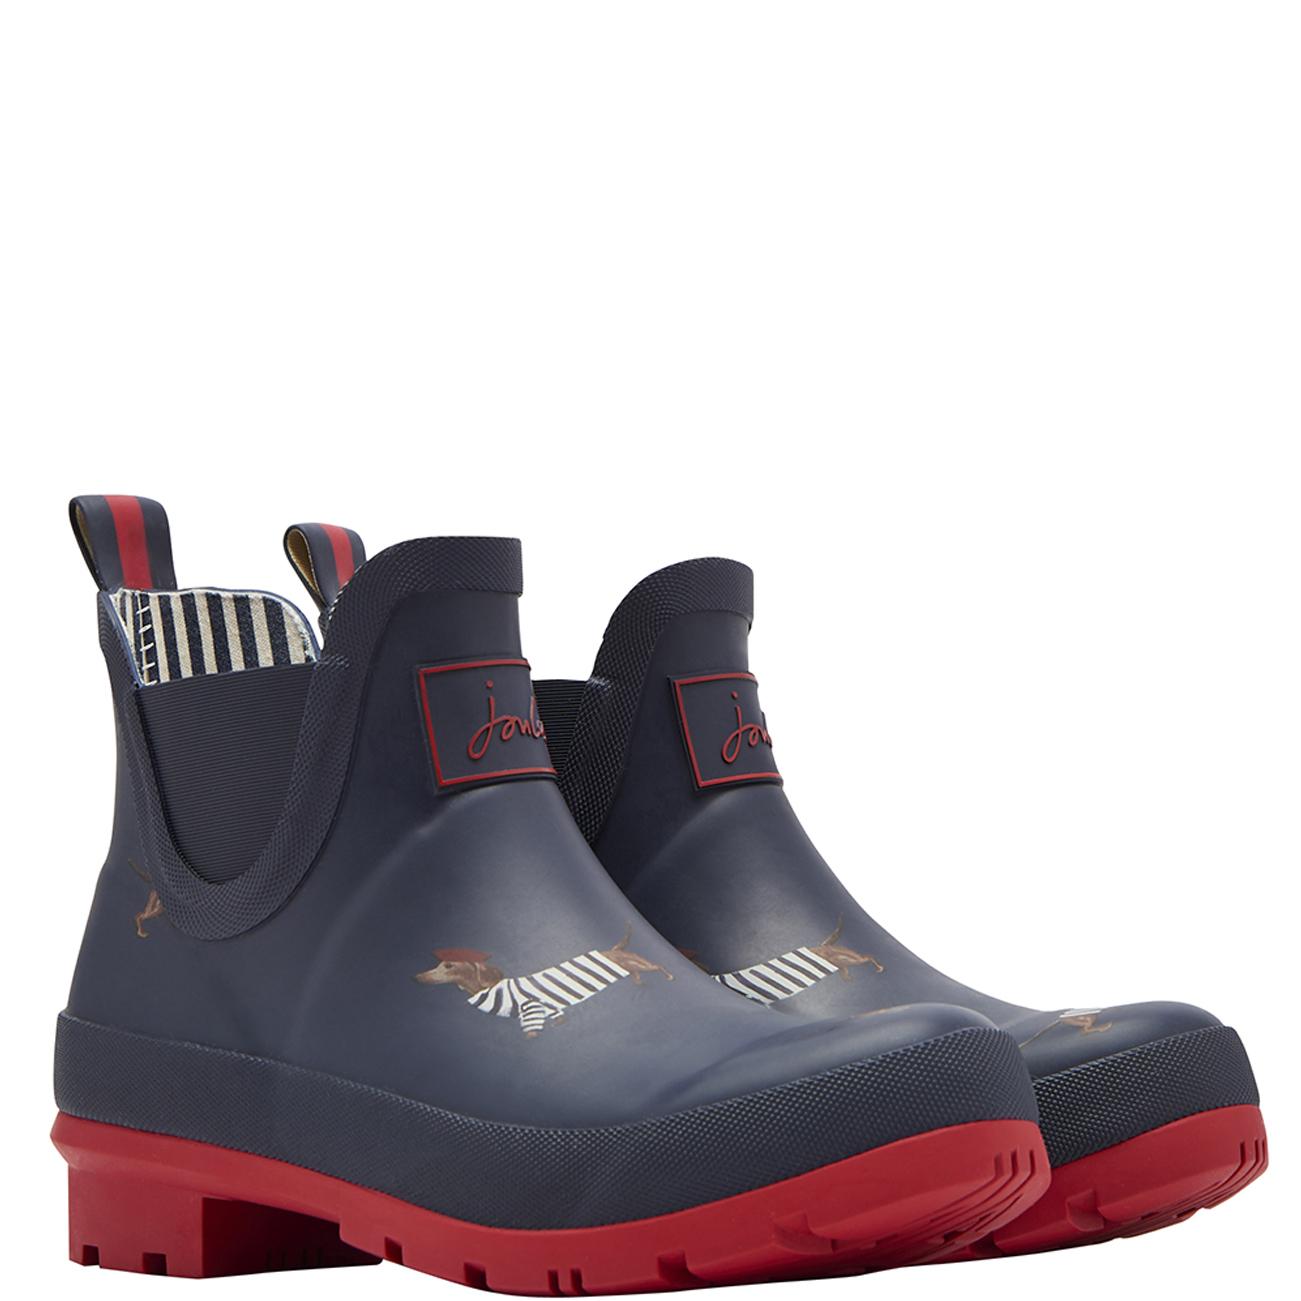 6607b9951d2e Boots Womens Joules Wellibob Rubber Winter Waterproof Wellington Ankle  Boots UK 3-8